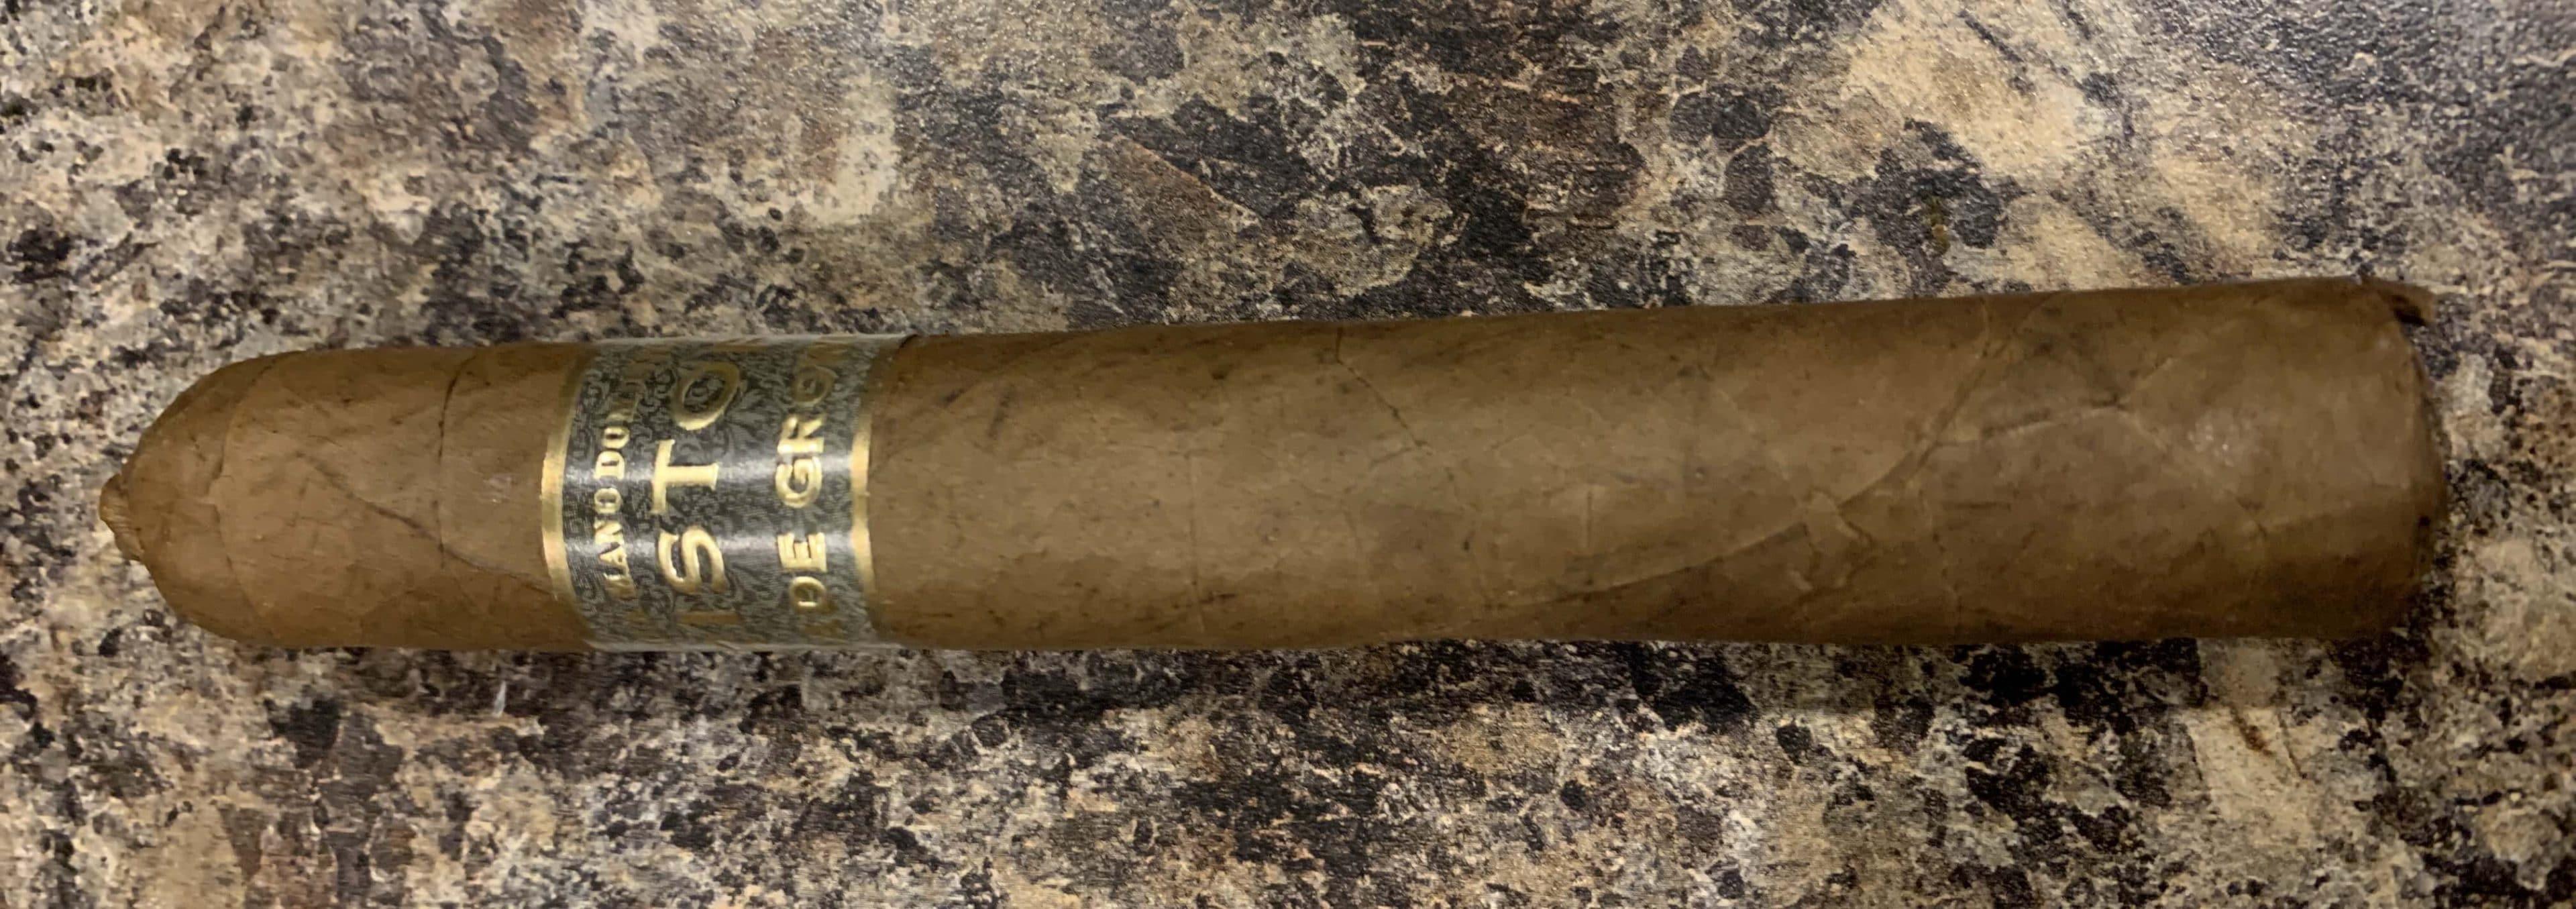 Quick Cigar Review: Kristoff | Shade Grown Robusto